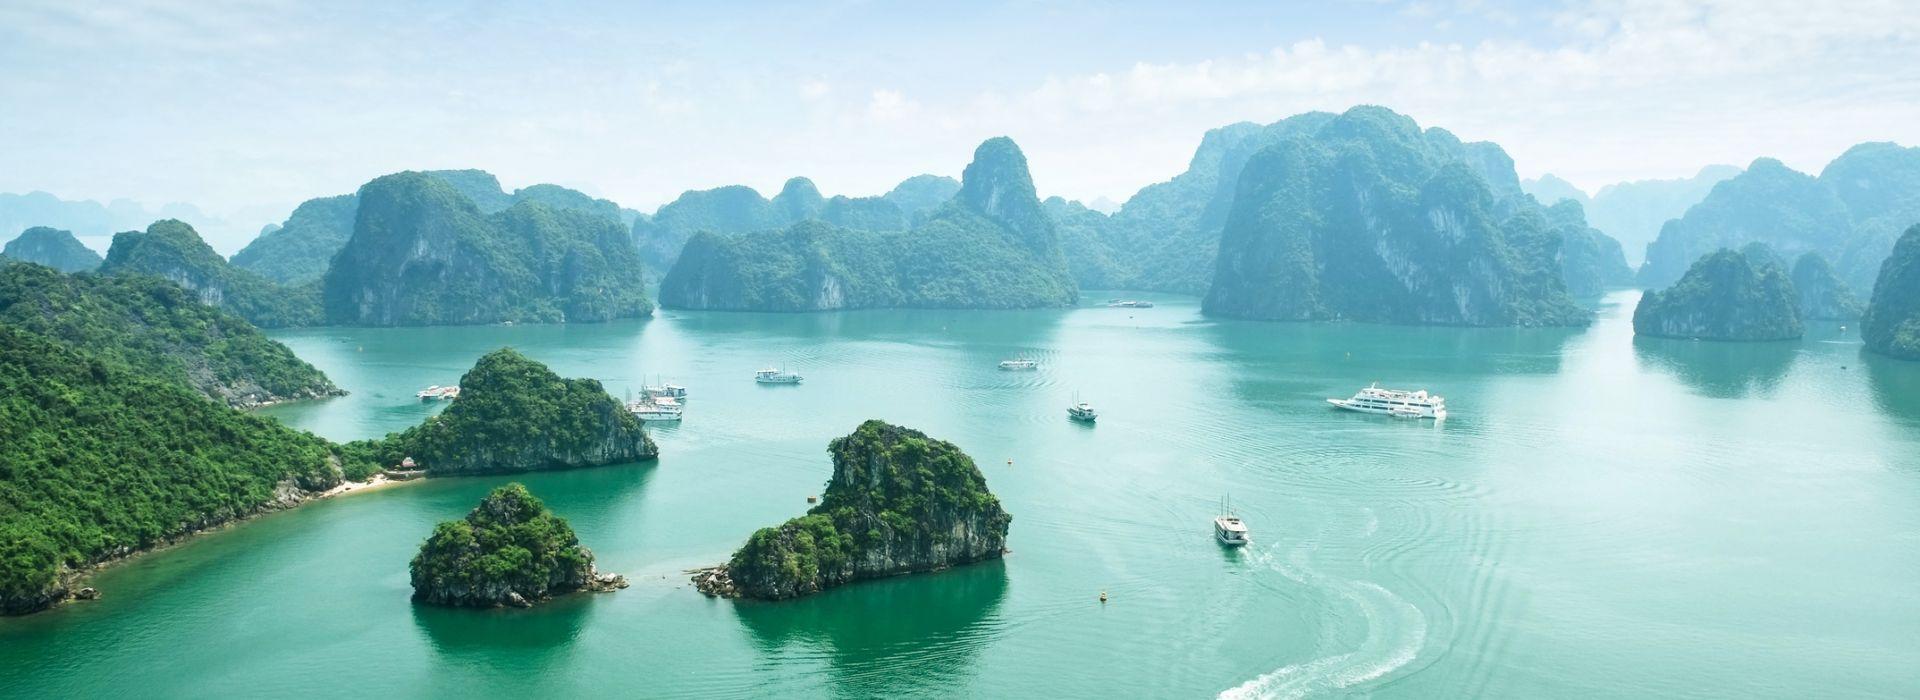 Luxury Tours in Vietnam